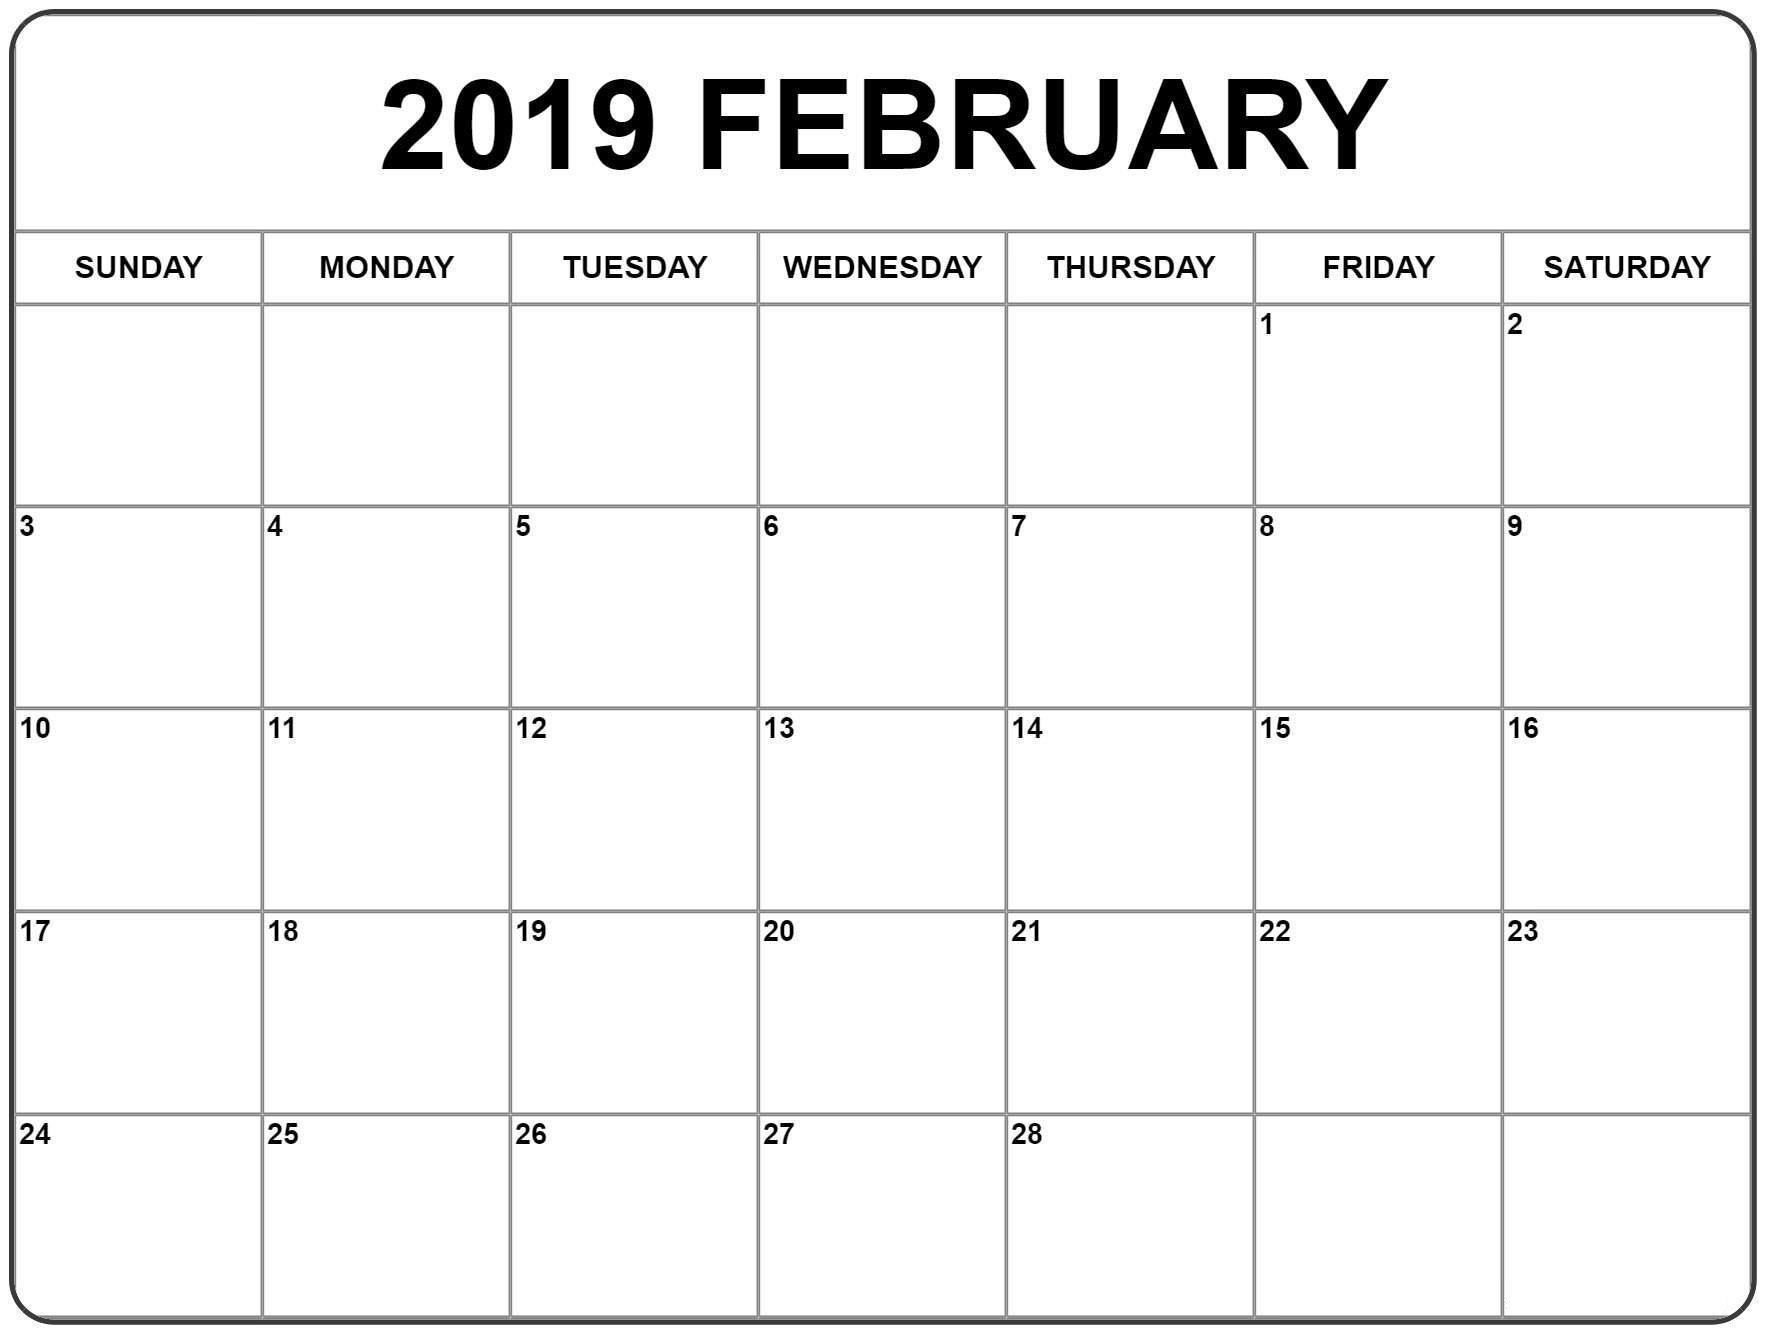 Print A Calendar February 2019 - Printable Calendar Templates Print-A-Calendar 2019